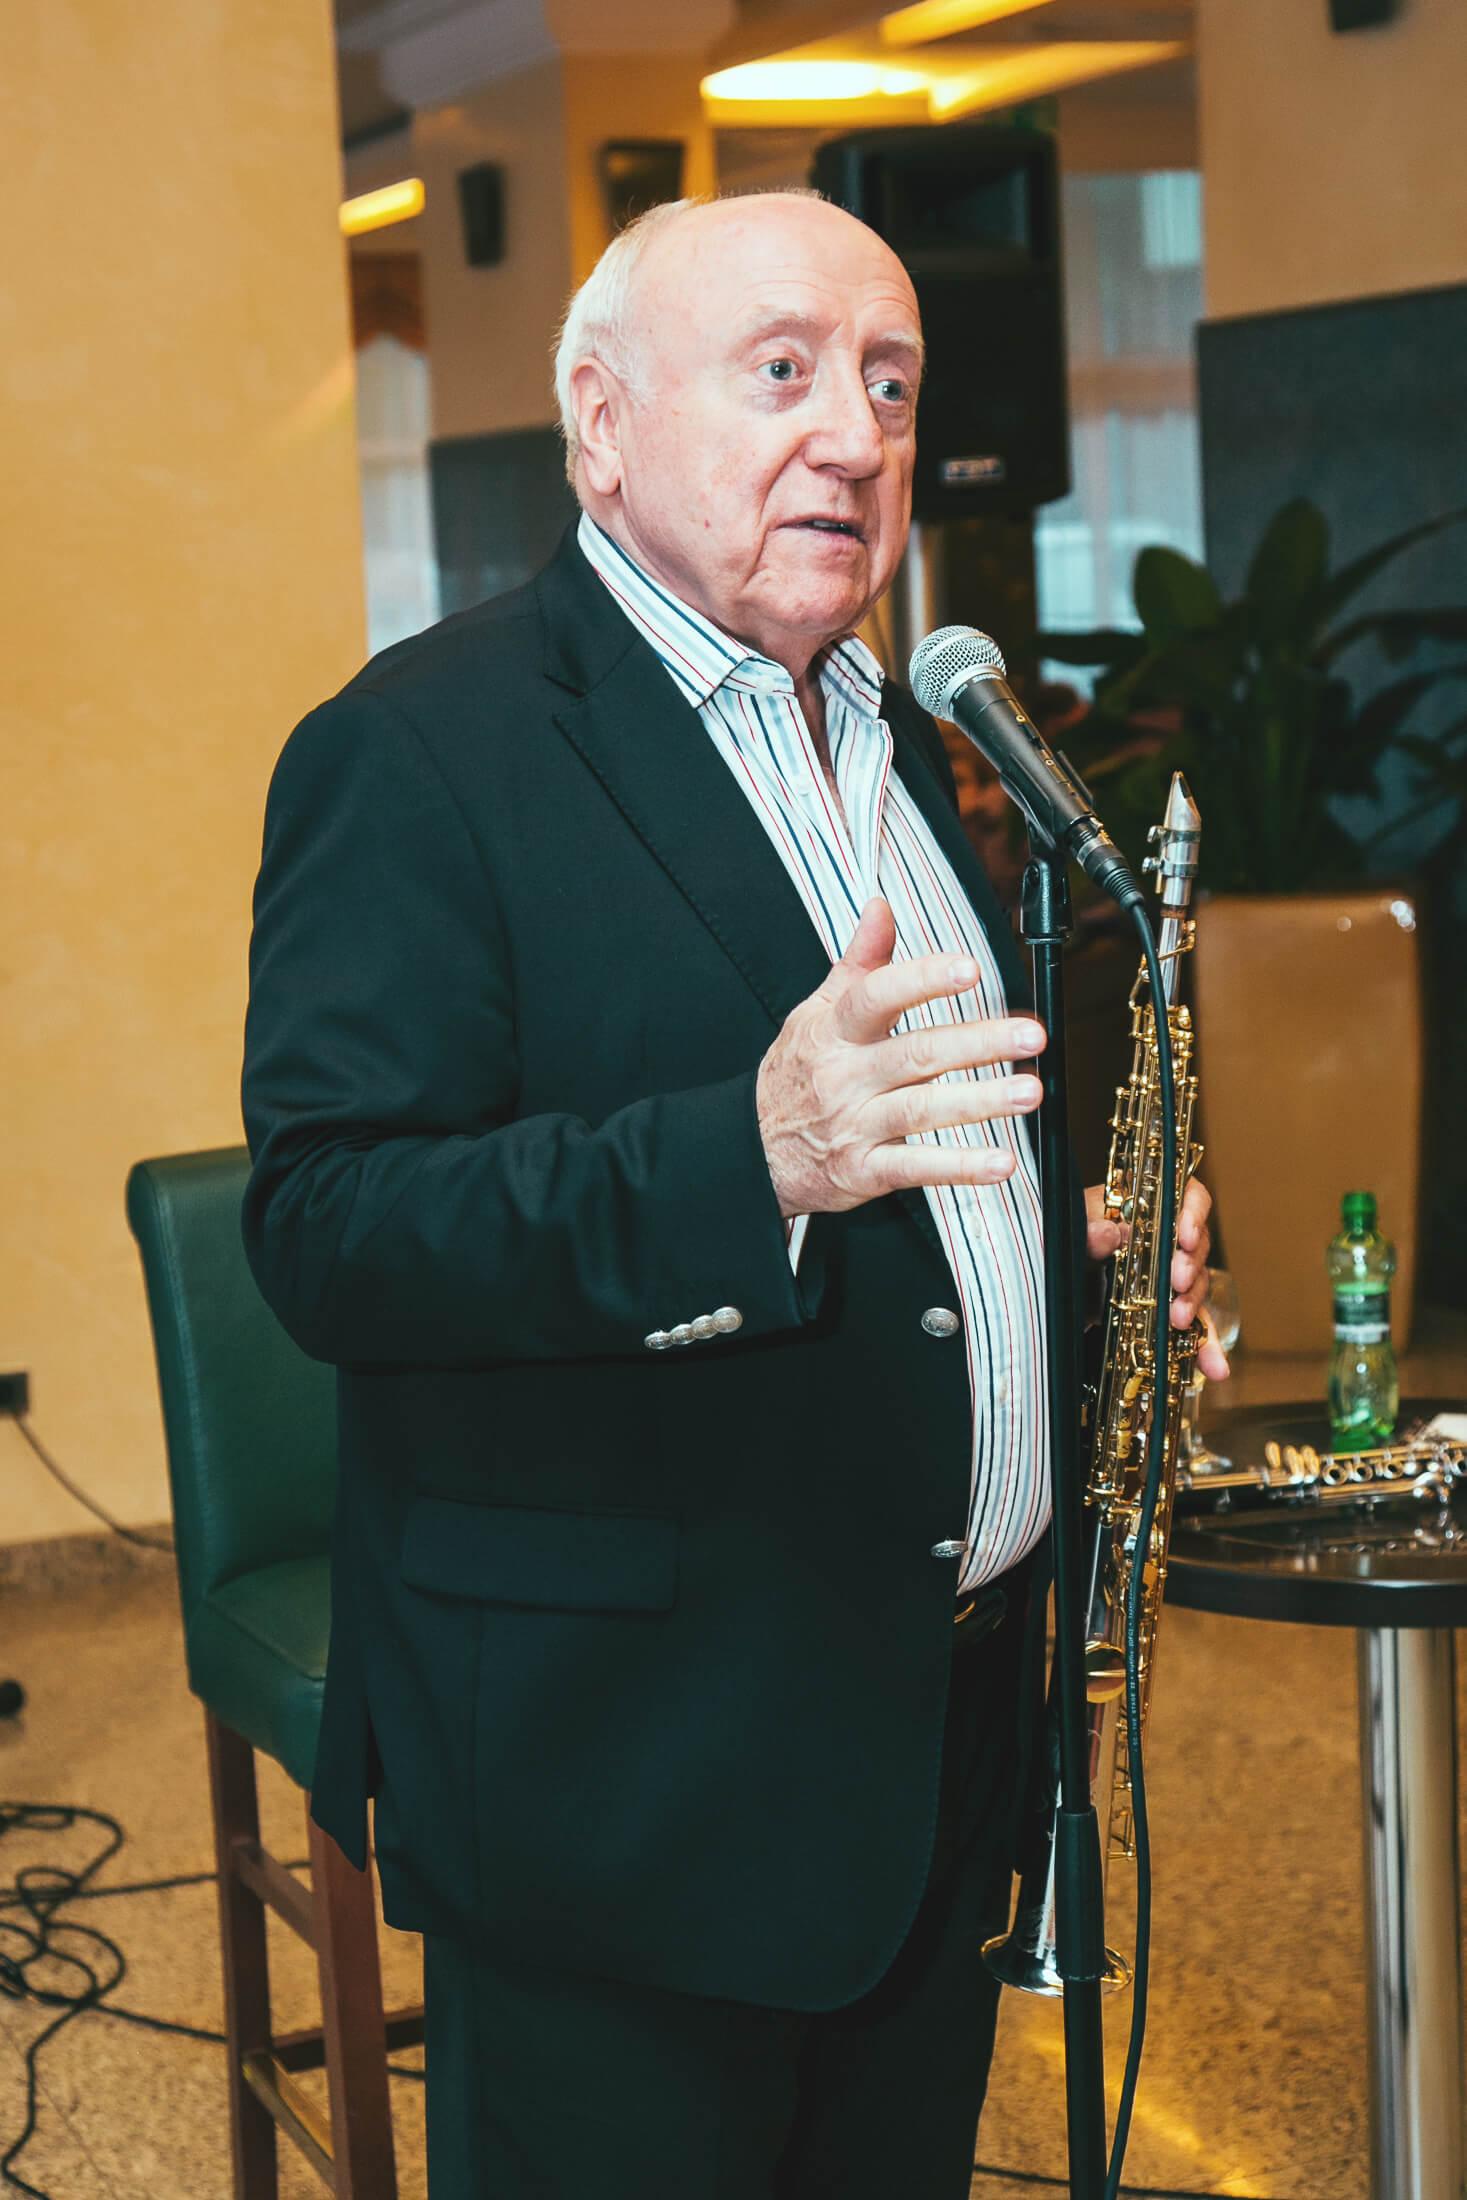 Koncert Félixa Slováčka v Brusne